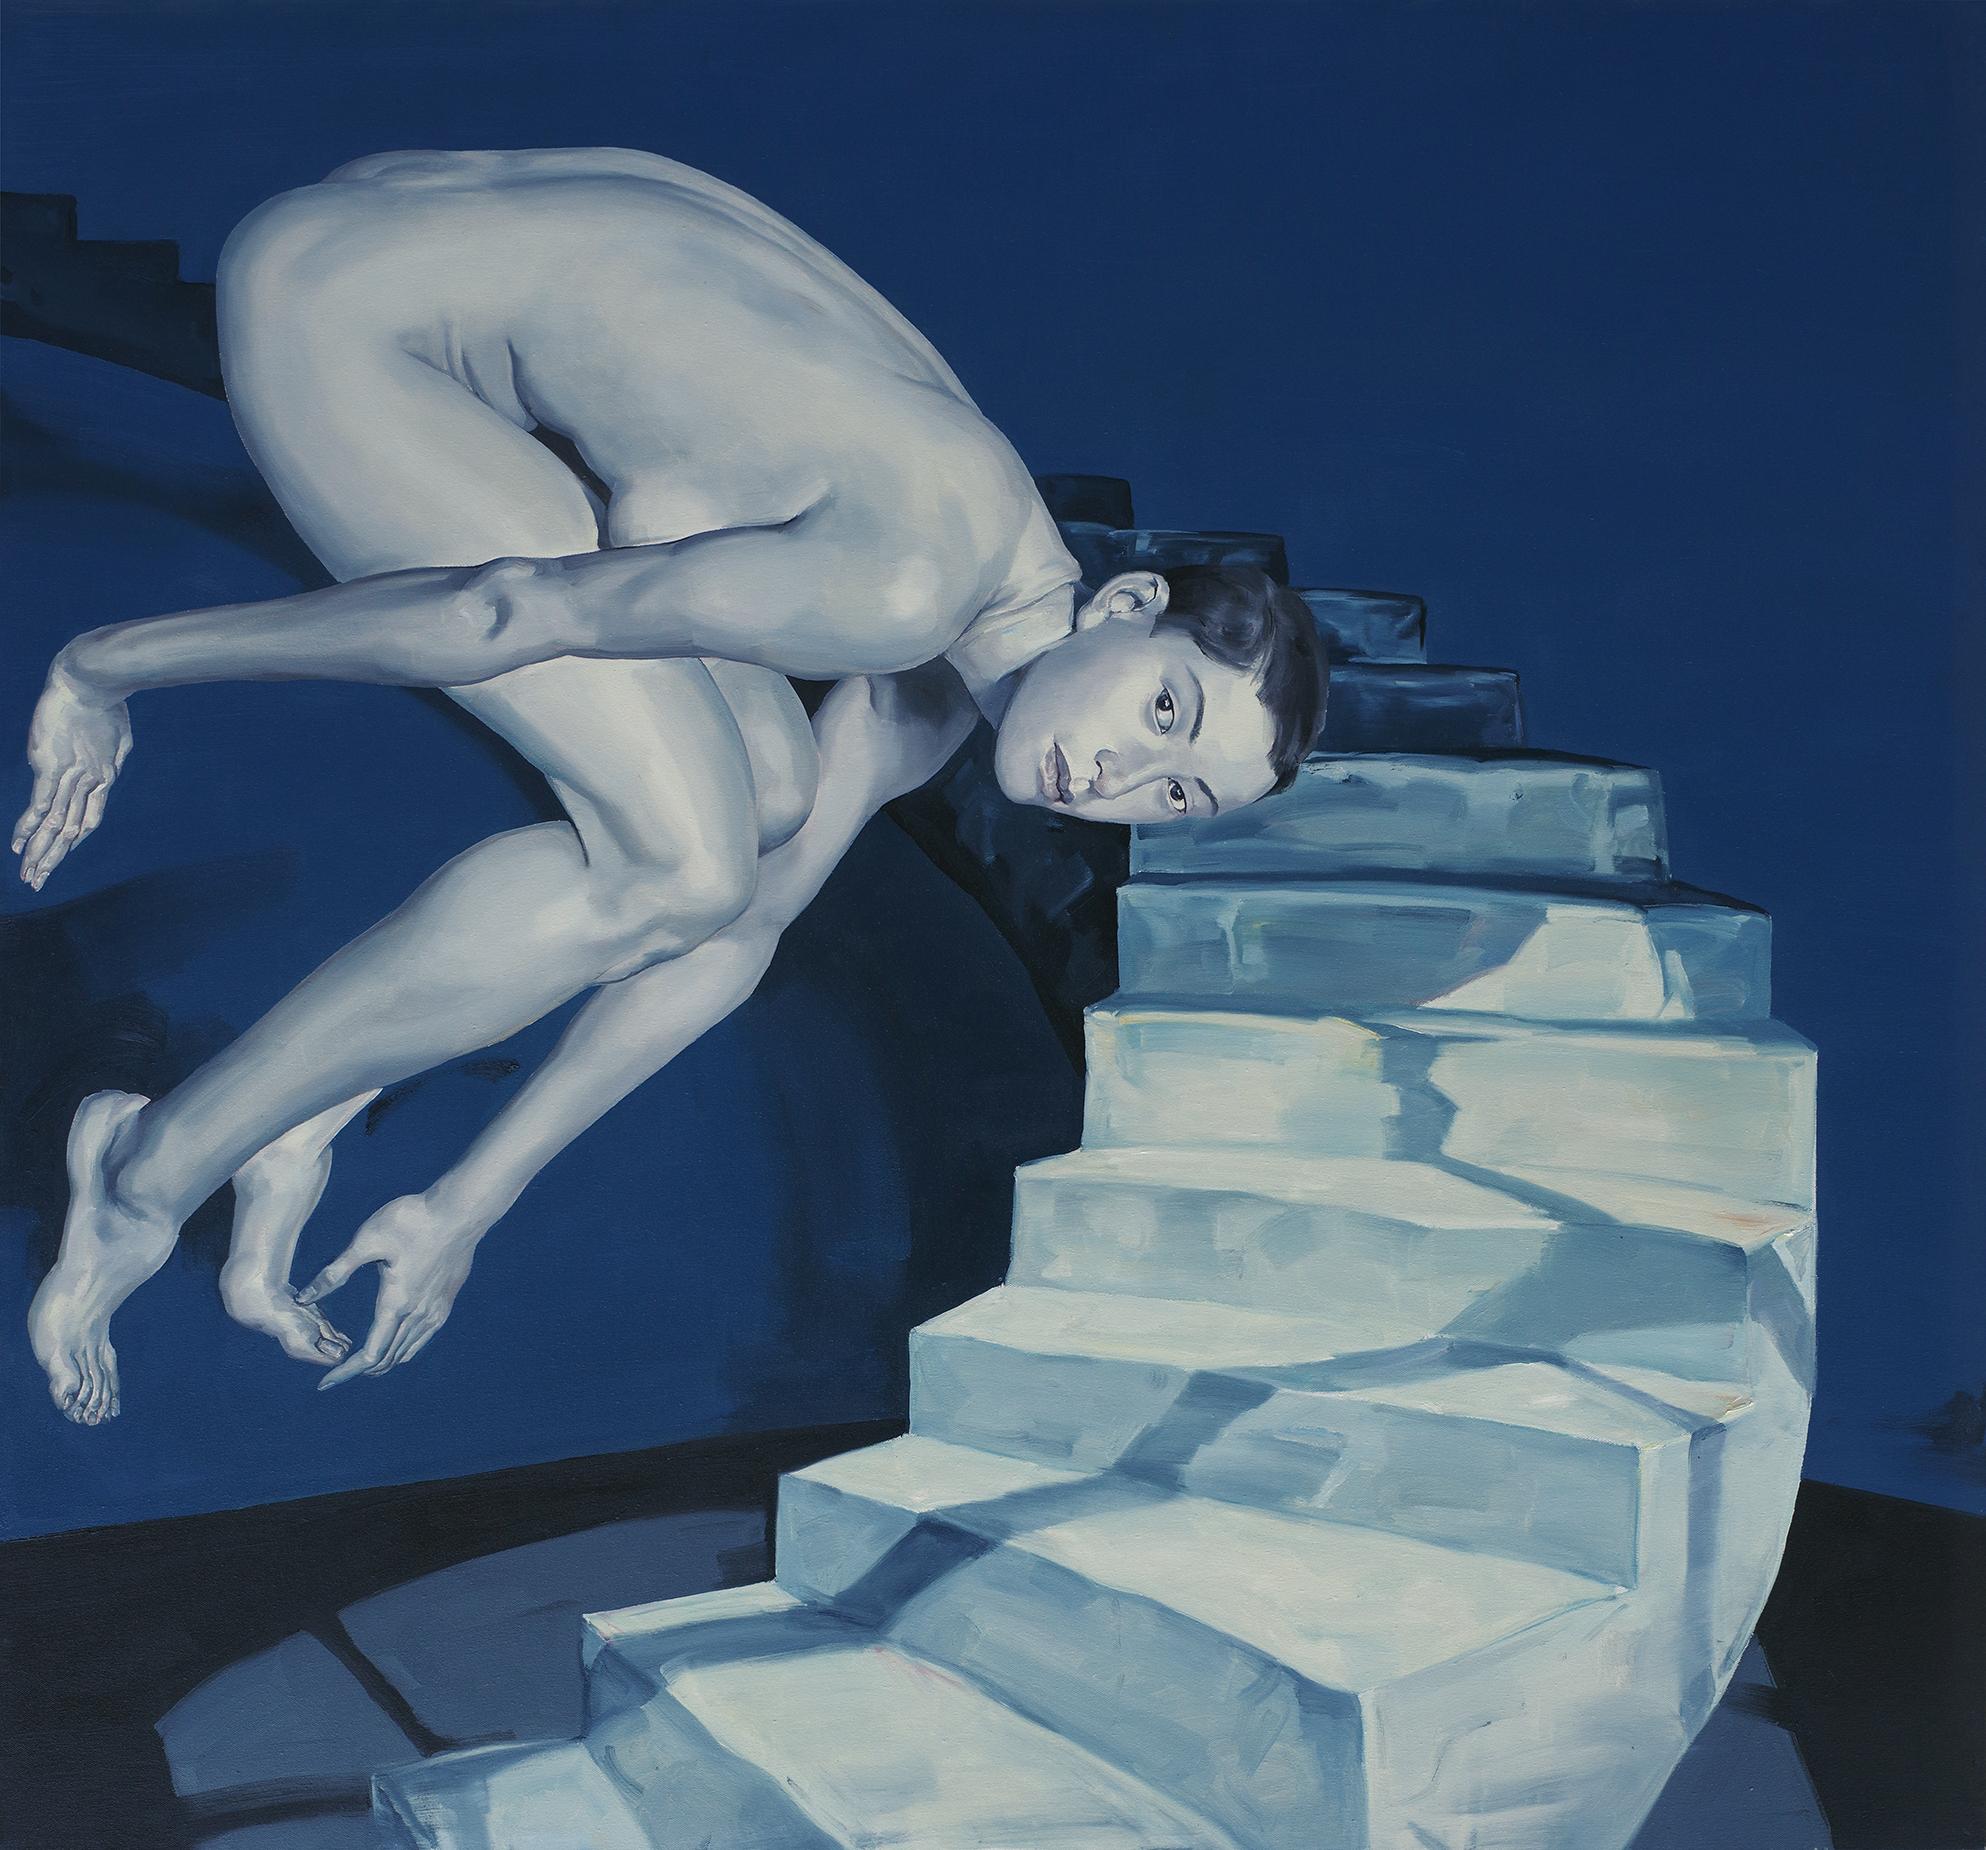 Wu Jun, City Migrator series: Spiral Staircase, 2010, oil on canvas, 150cm x 160cm